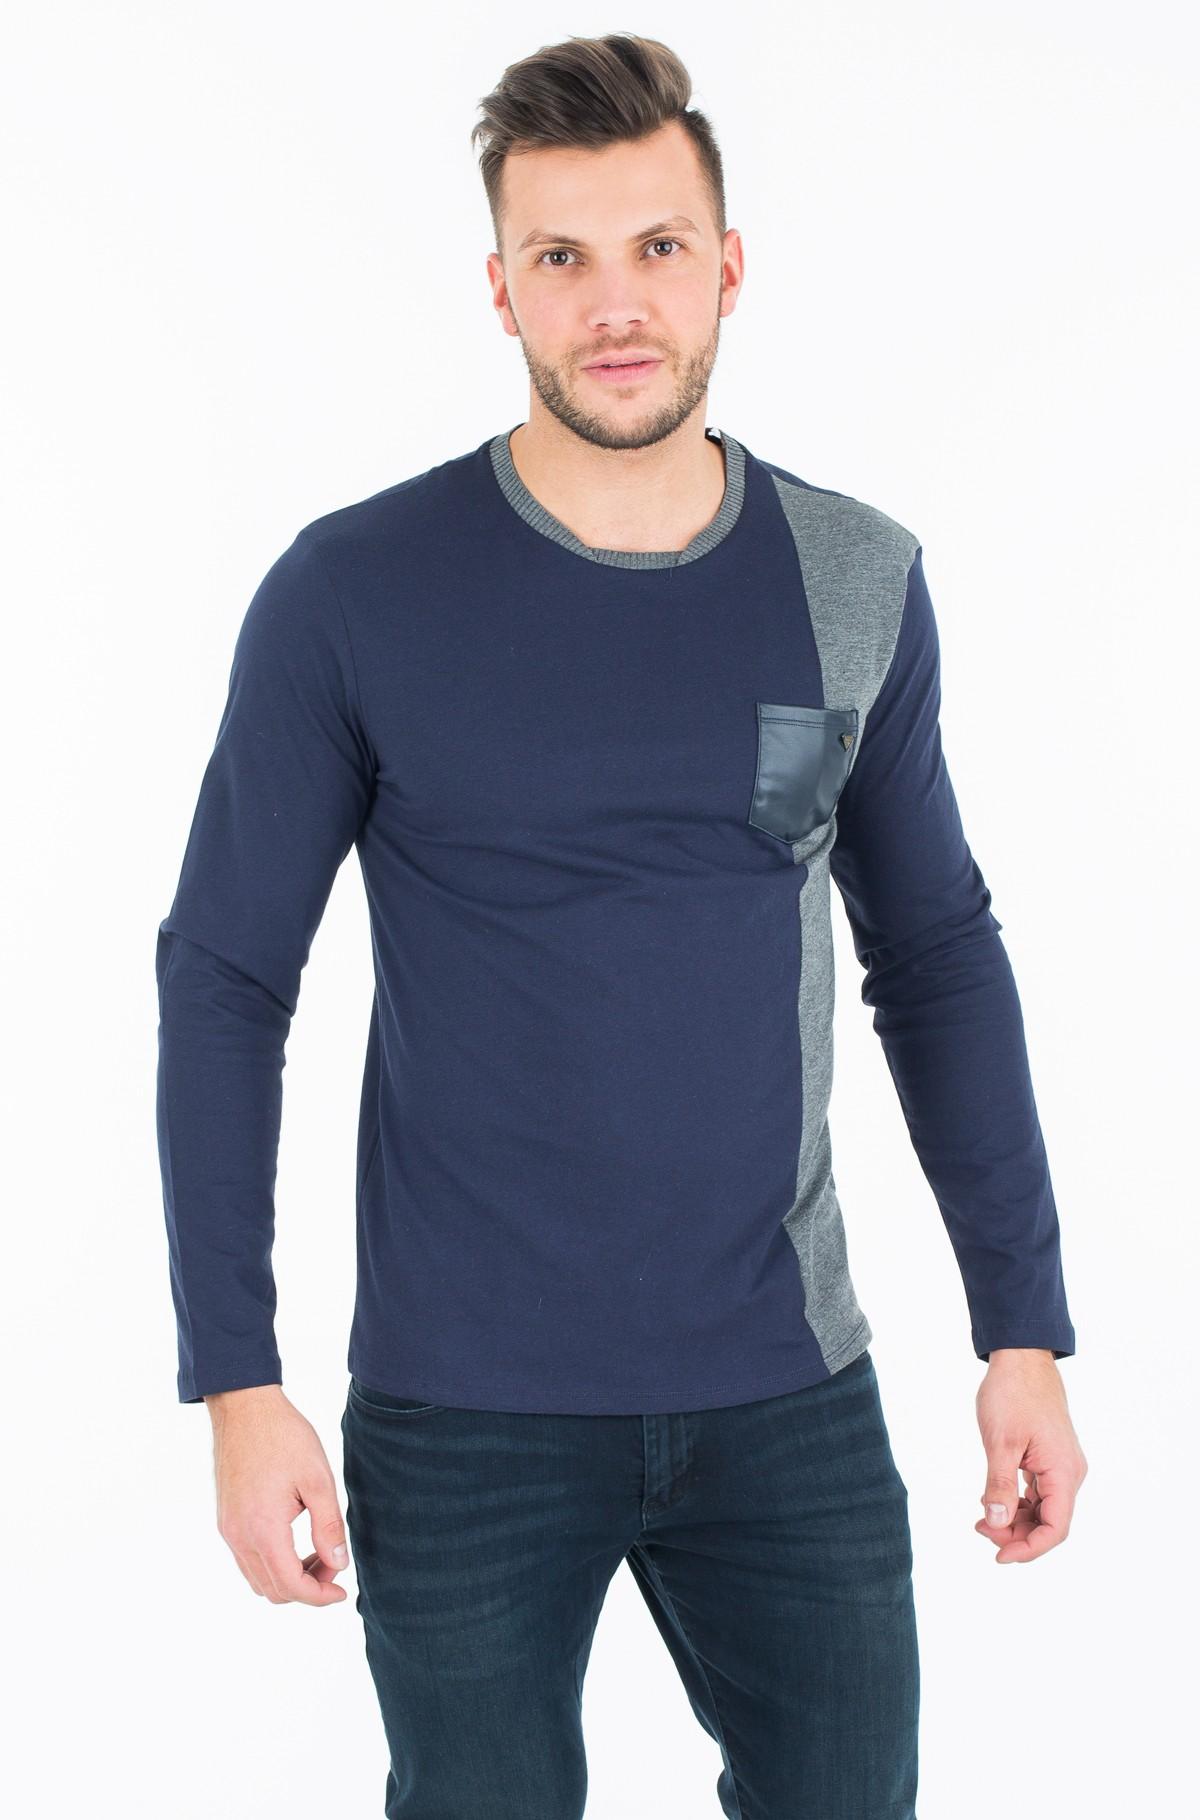 T-krekls ar garām piedurknēm  M74P02 K7BA0-full-1